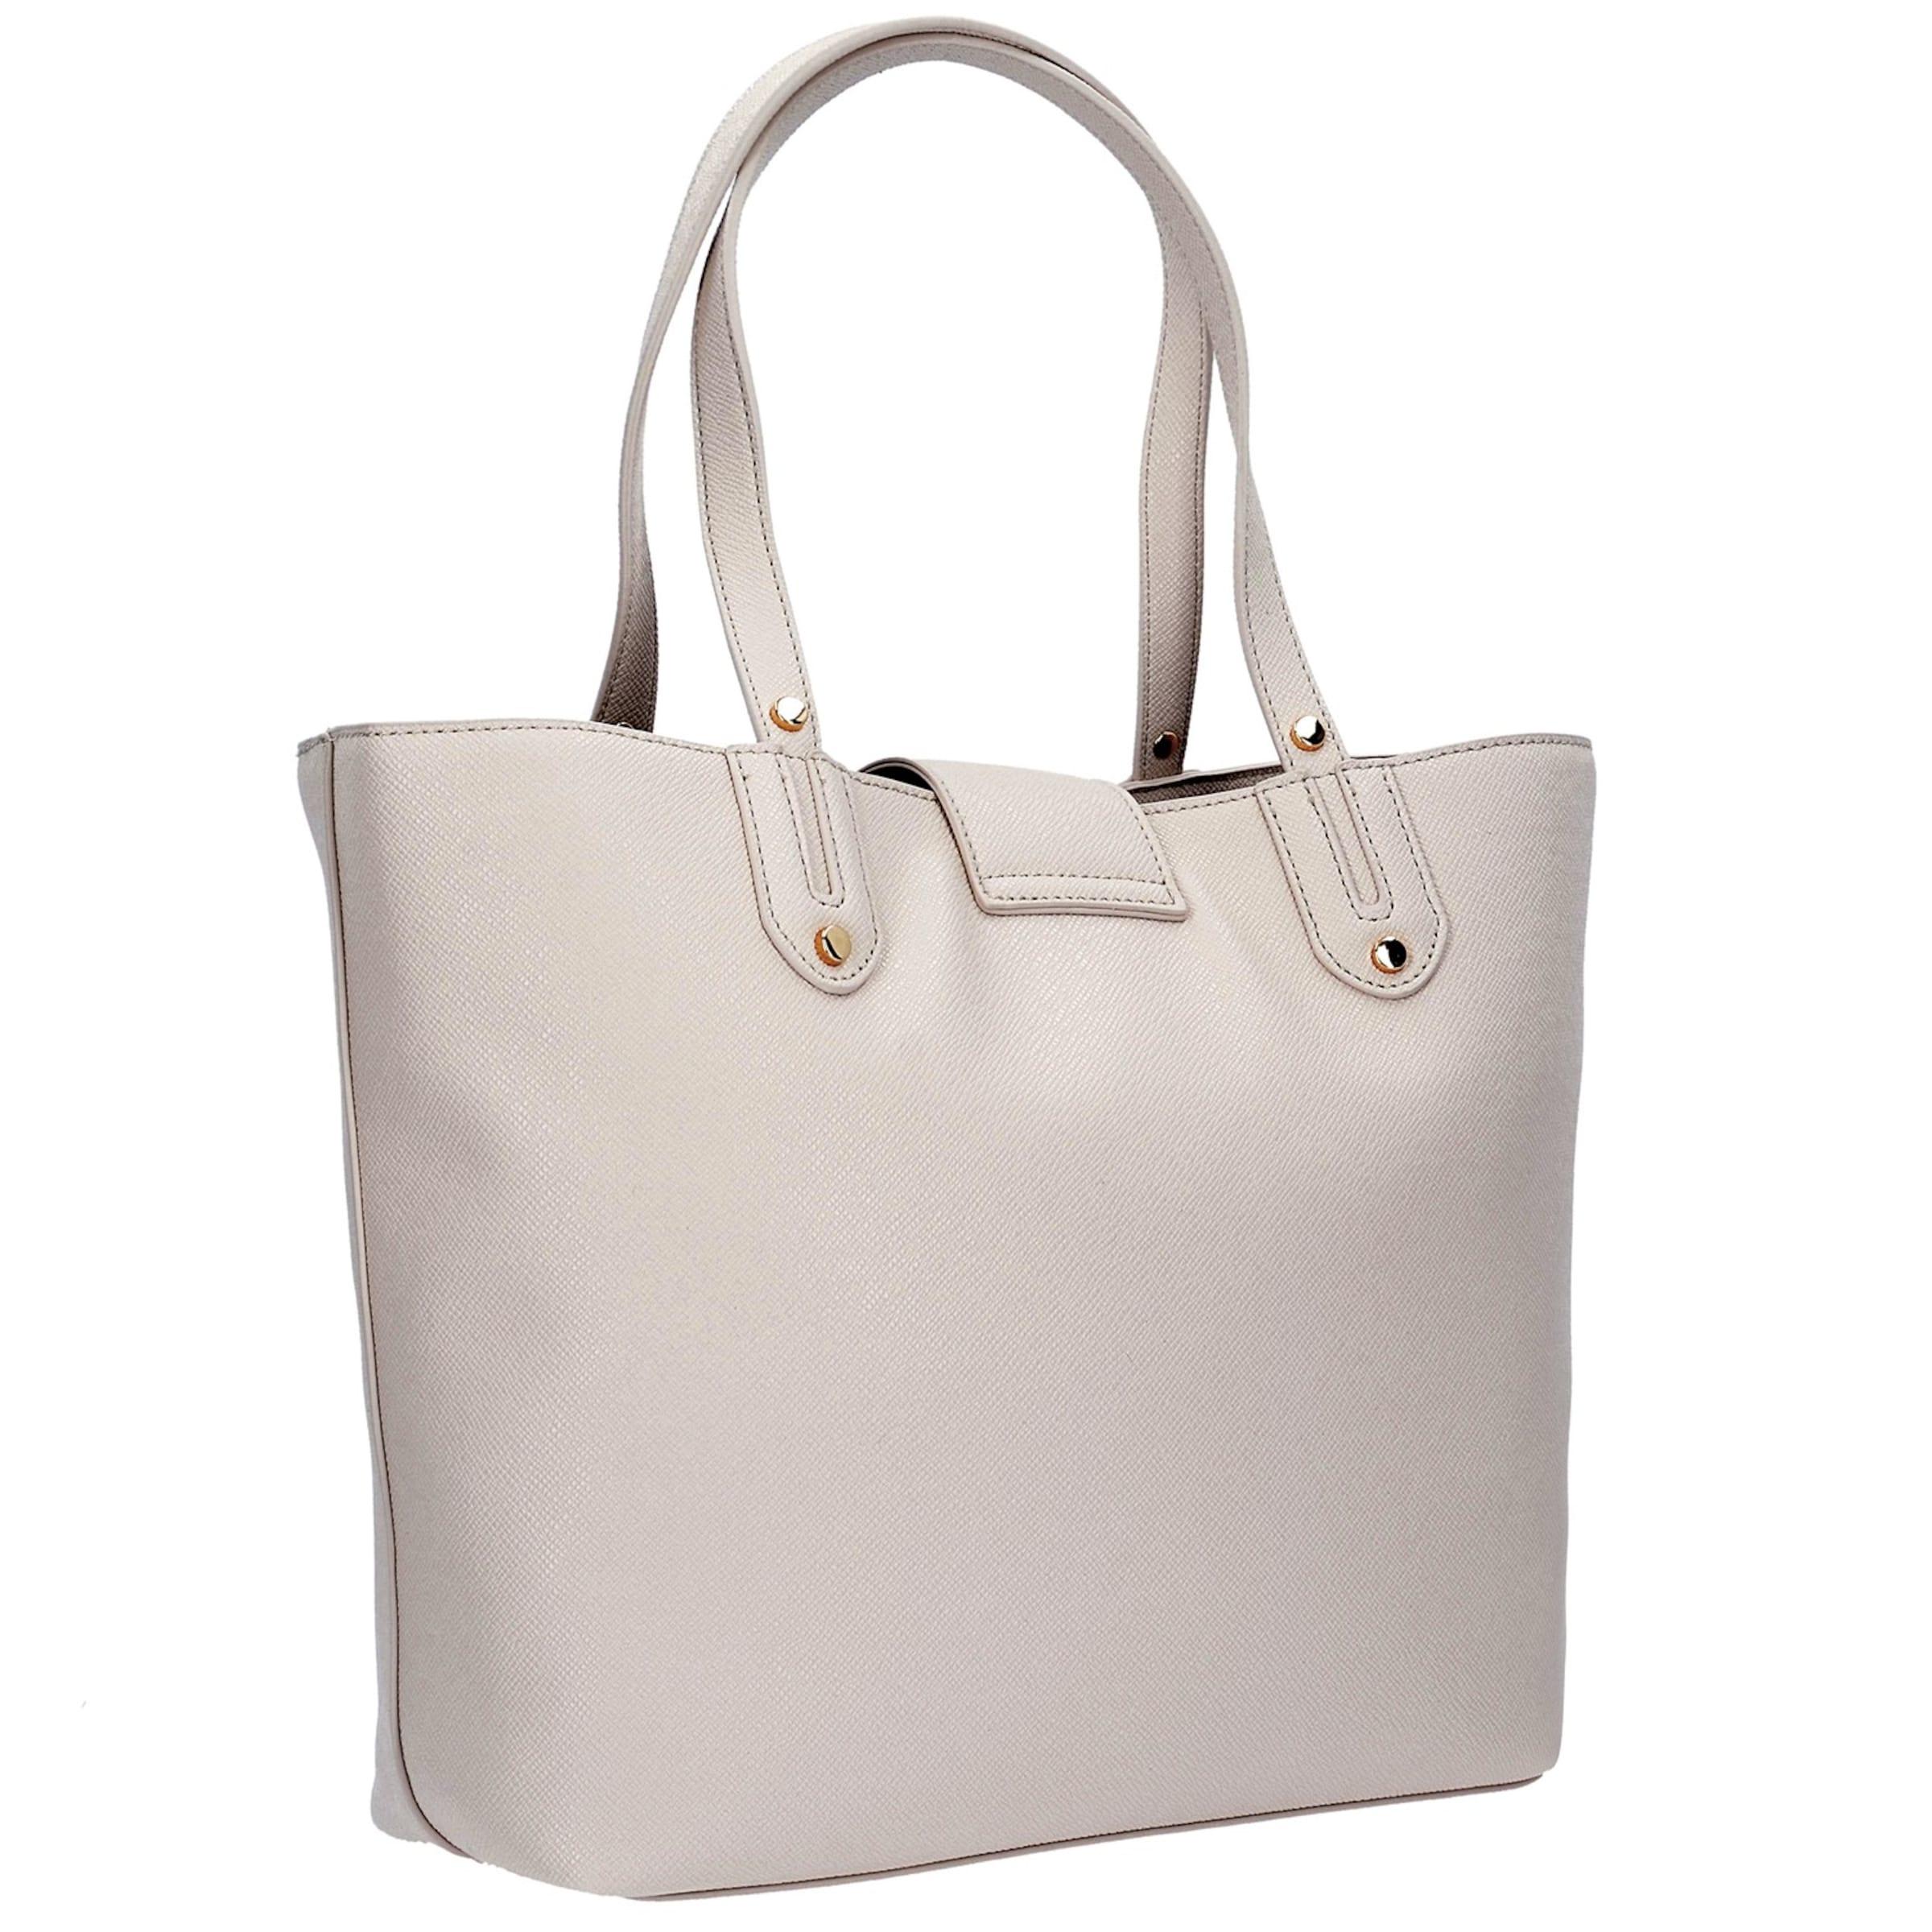 Niedrige Versandgebühr Verkauf Online Liu Jo 'New Kos' Shopper 30 cm Kosten 0hPMl